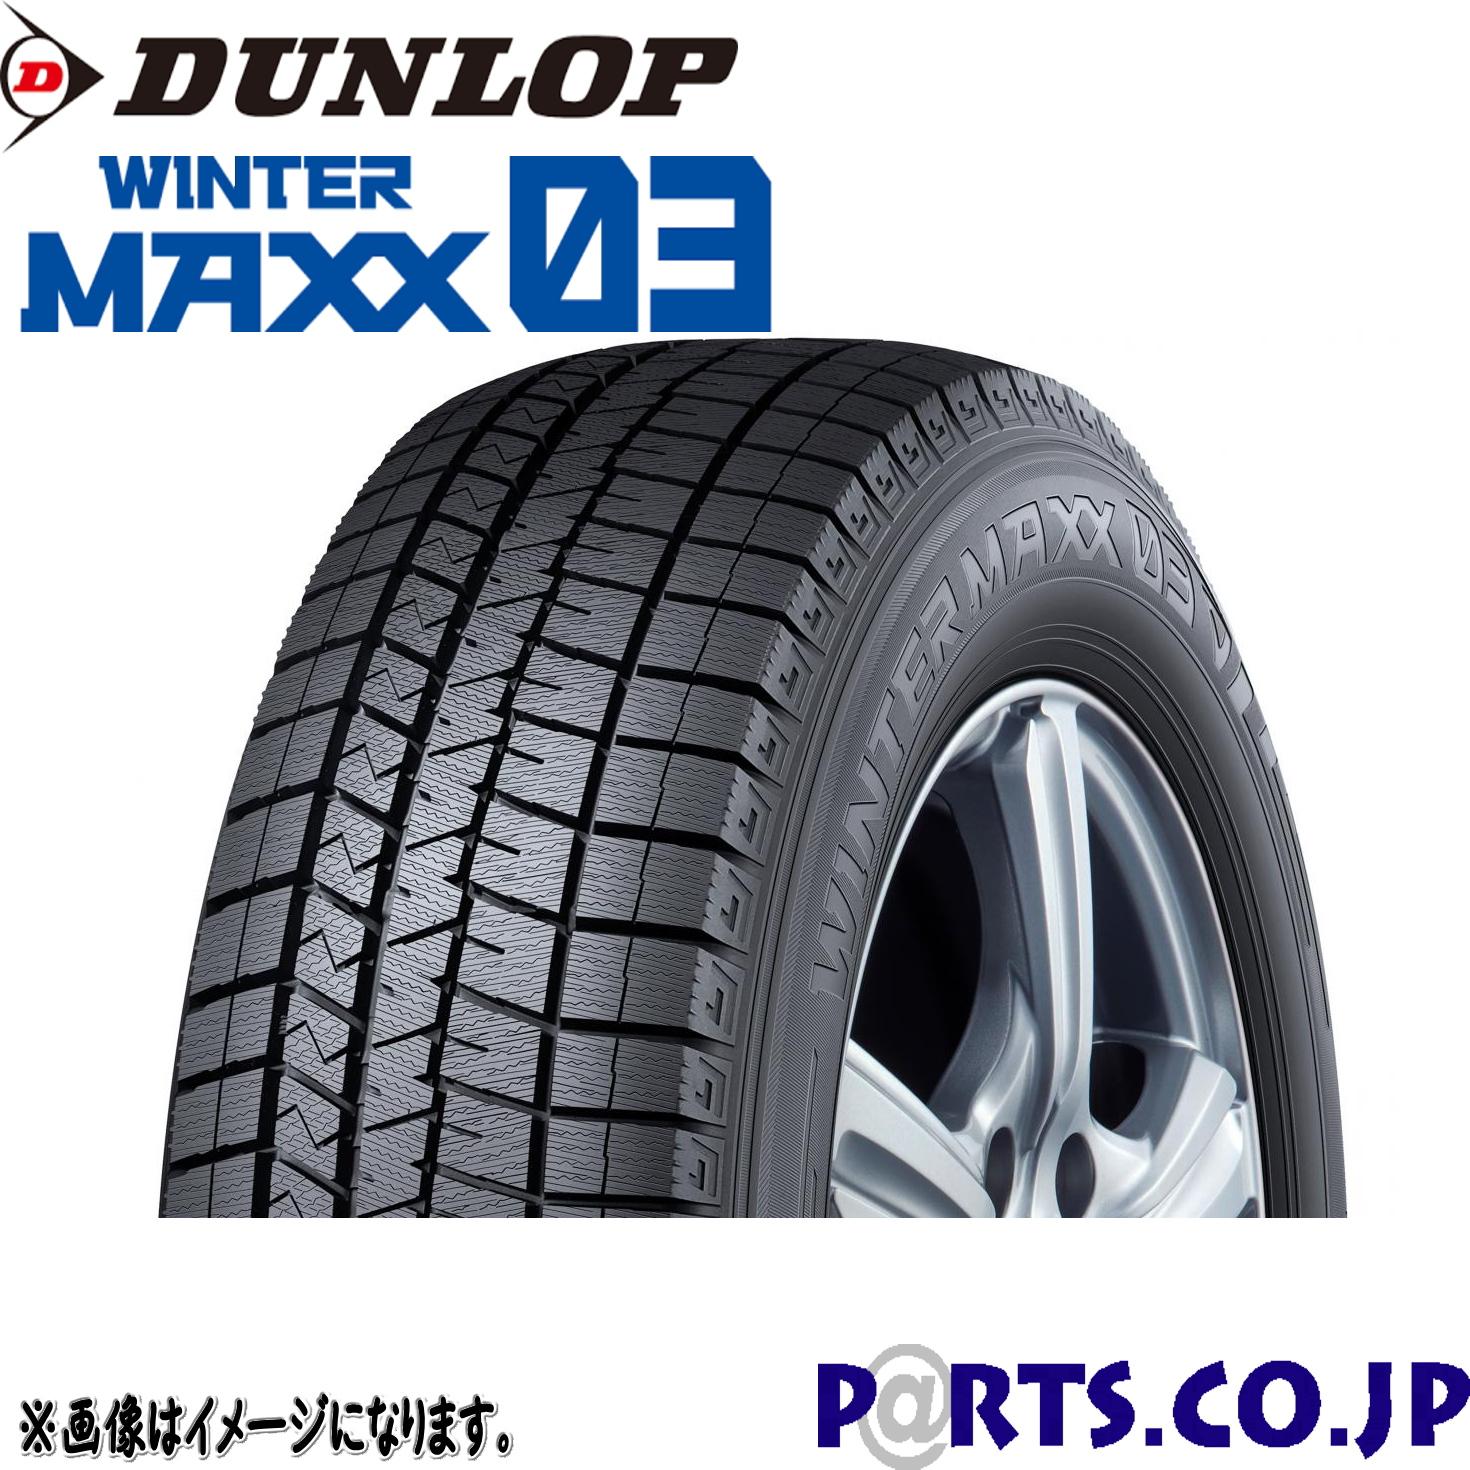 DUNLOP オープニング 大放出セール ダンロップ WINTER MAXX WM03 55R15 75Q 165 値引き